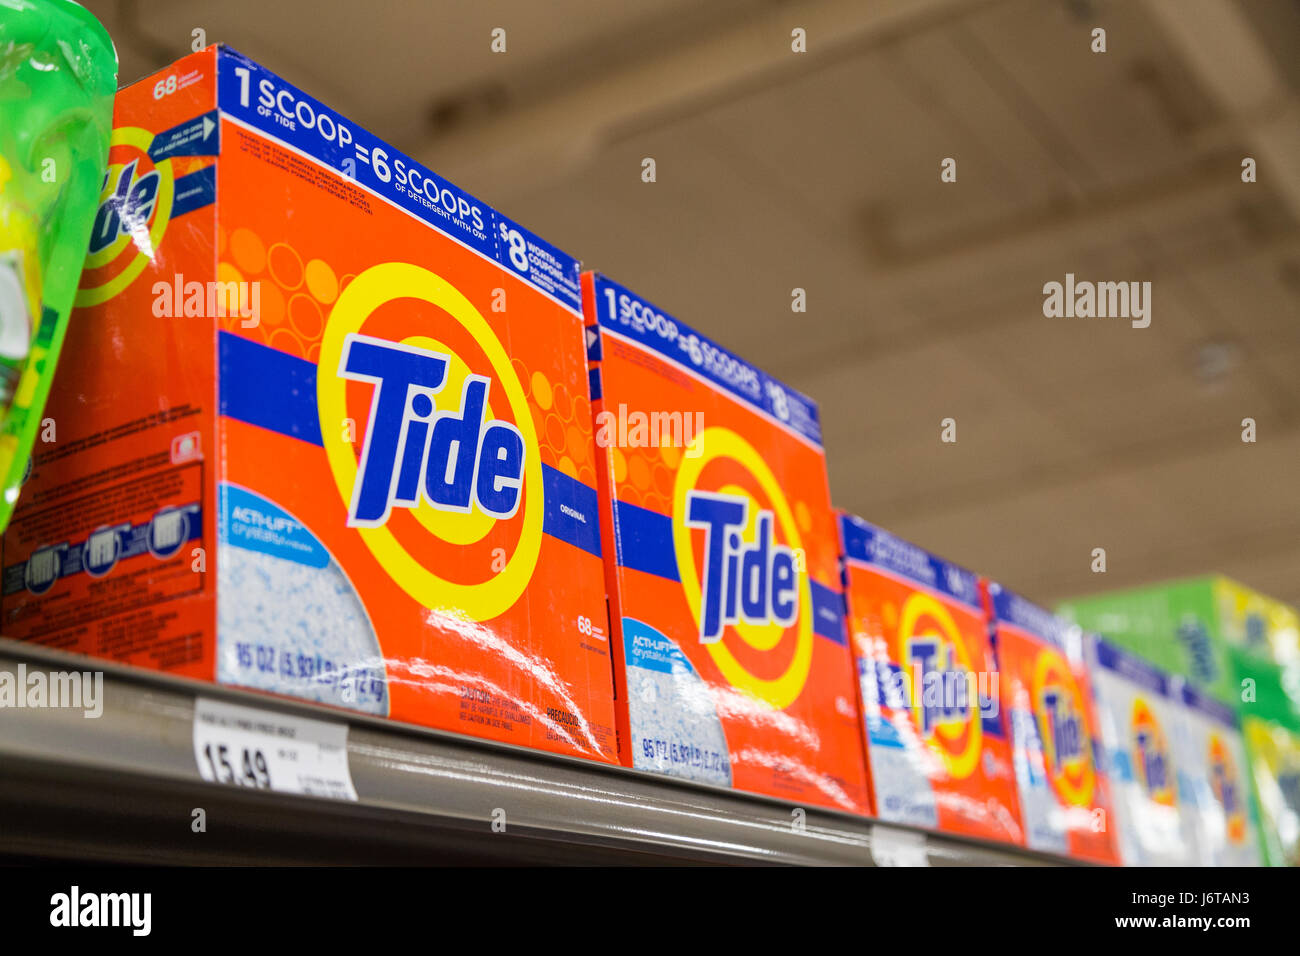 laundry detergent brand stock photos amp laundry detergent